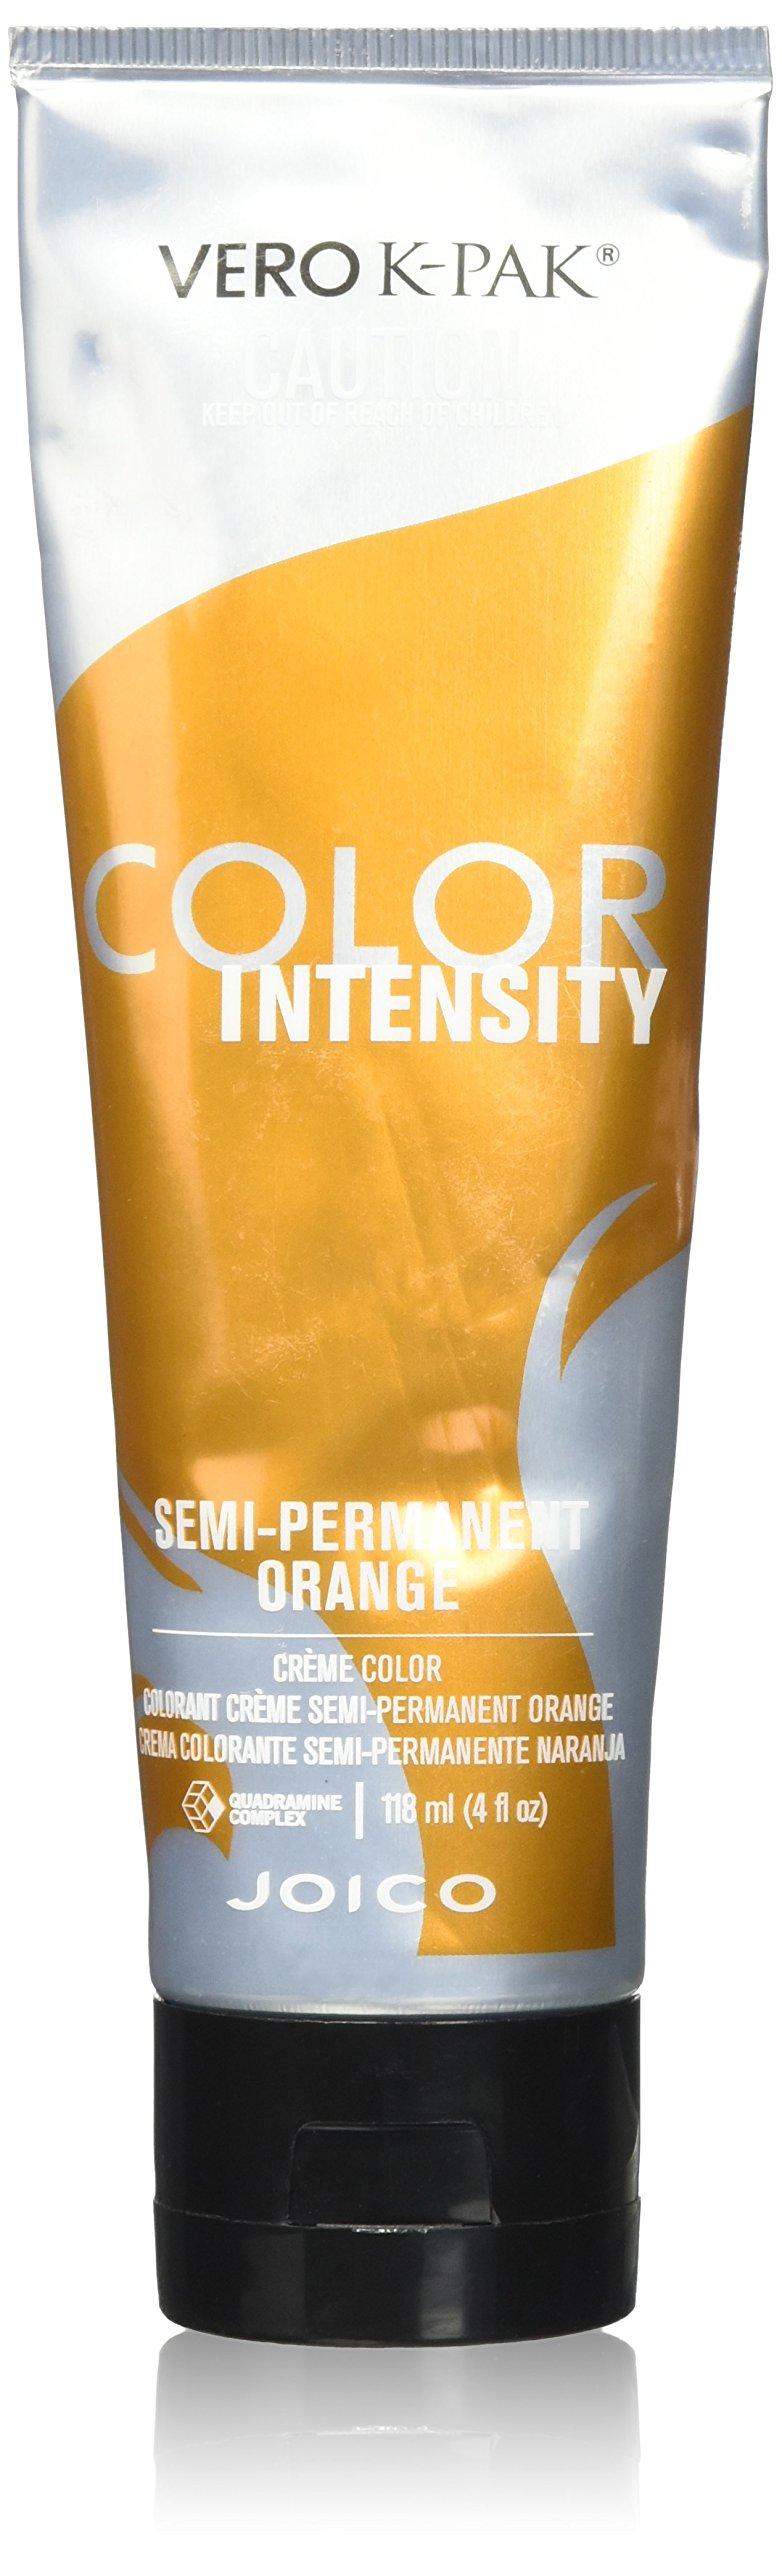 Amazon joico vero k pak color intensity semi permanent hair joico intensity semi permanent hair color orange 4 ounce nvjuhfo Image collections